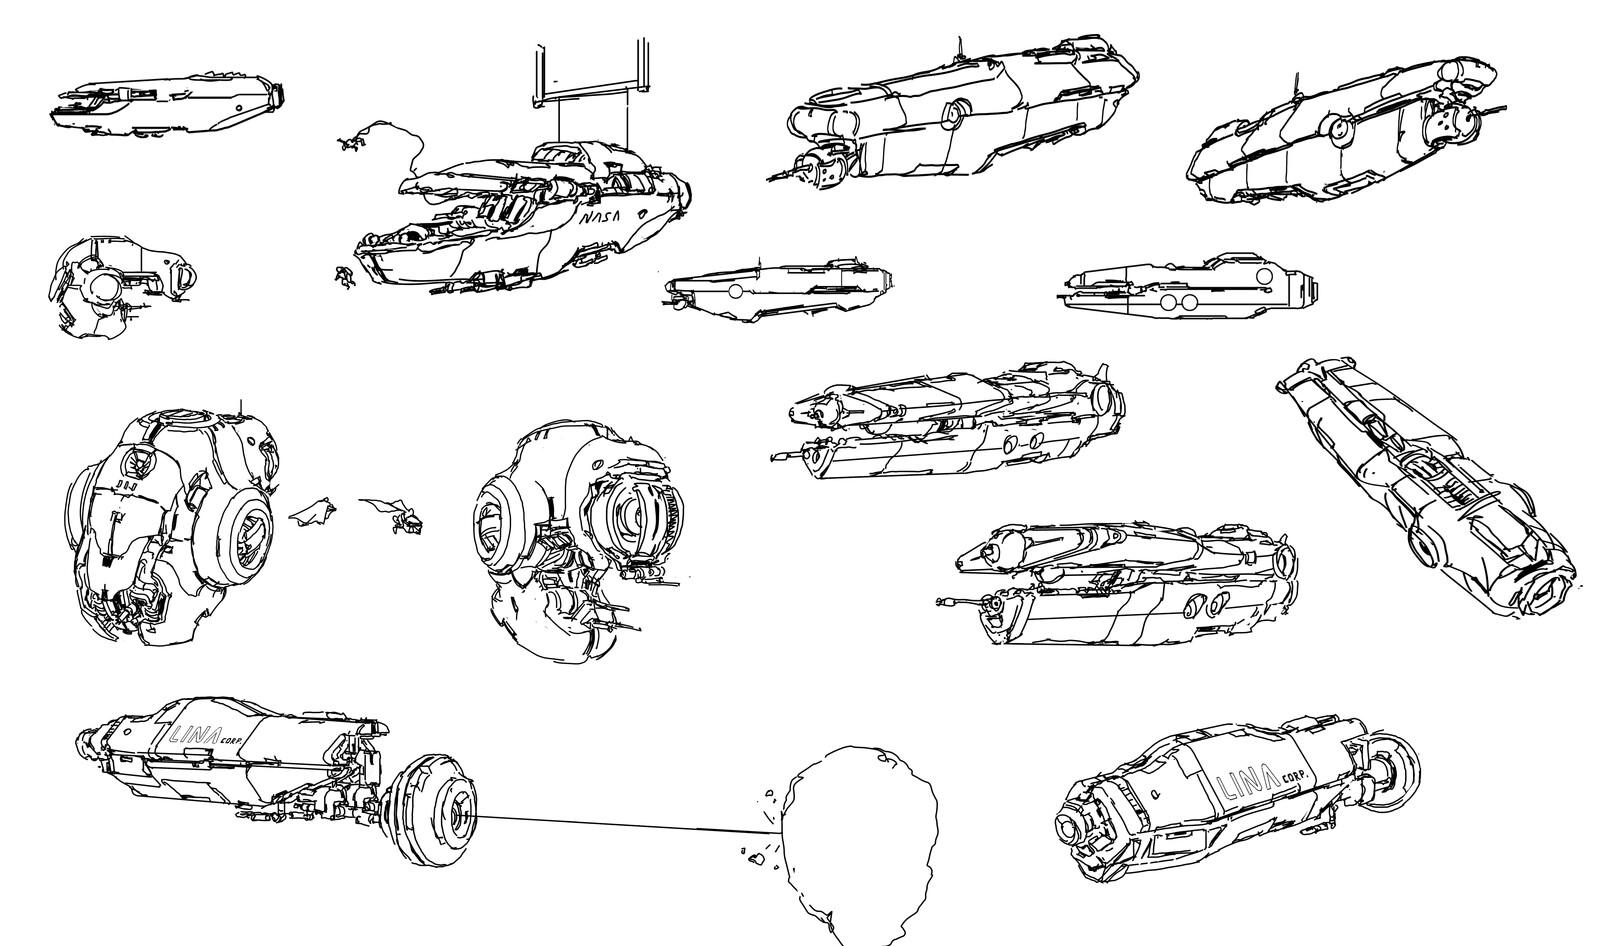 random ship doodle 4